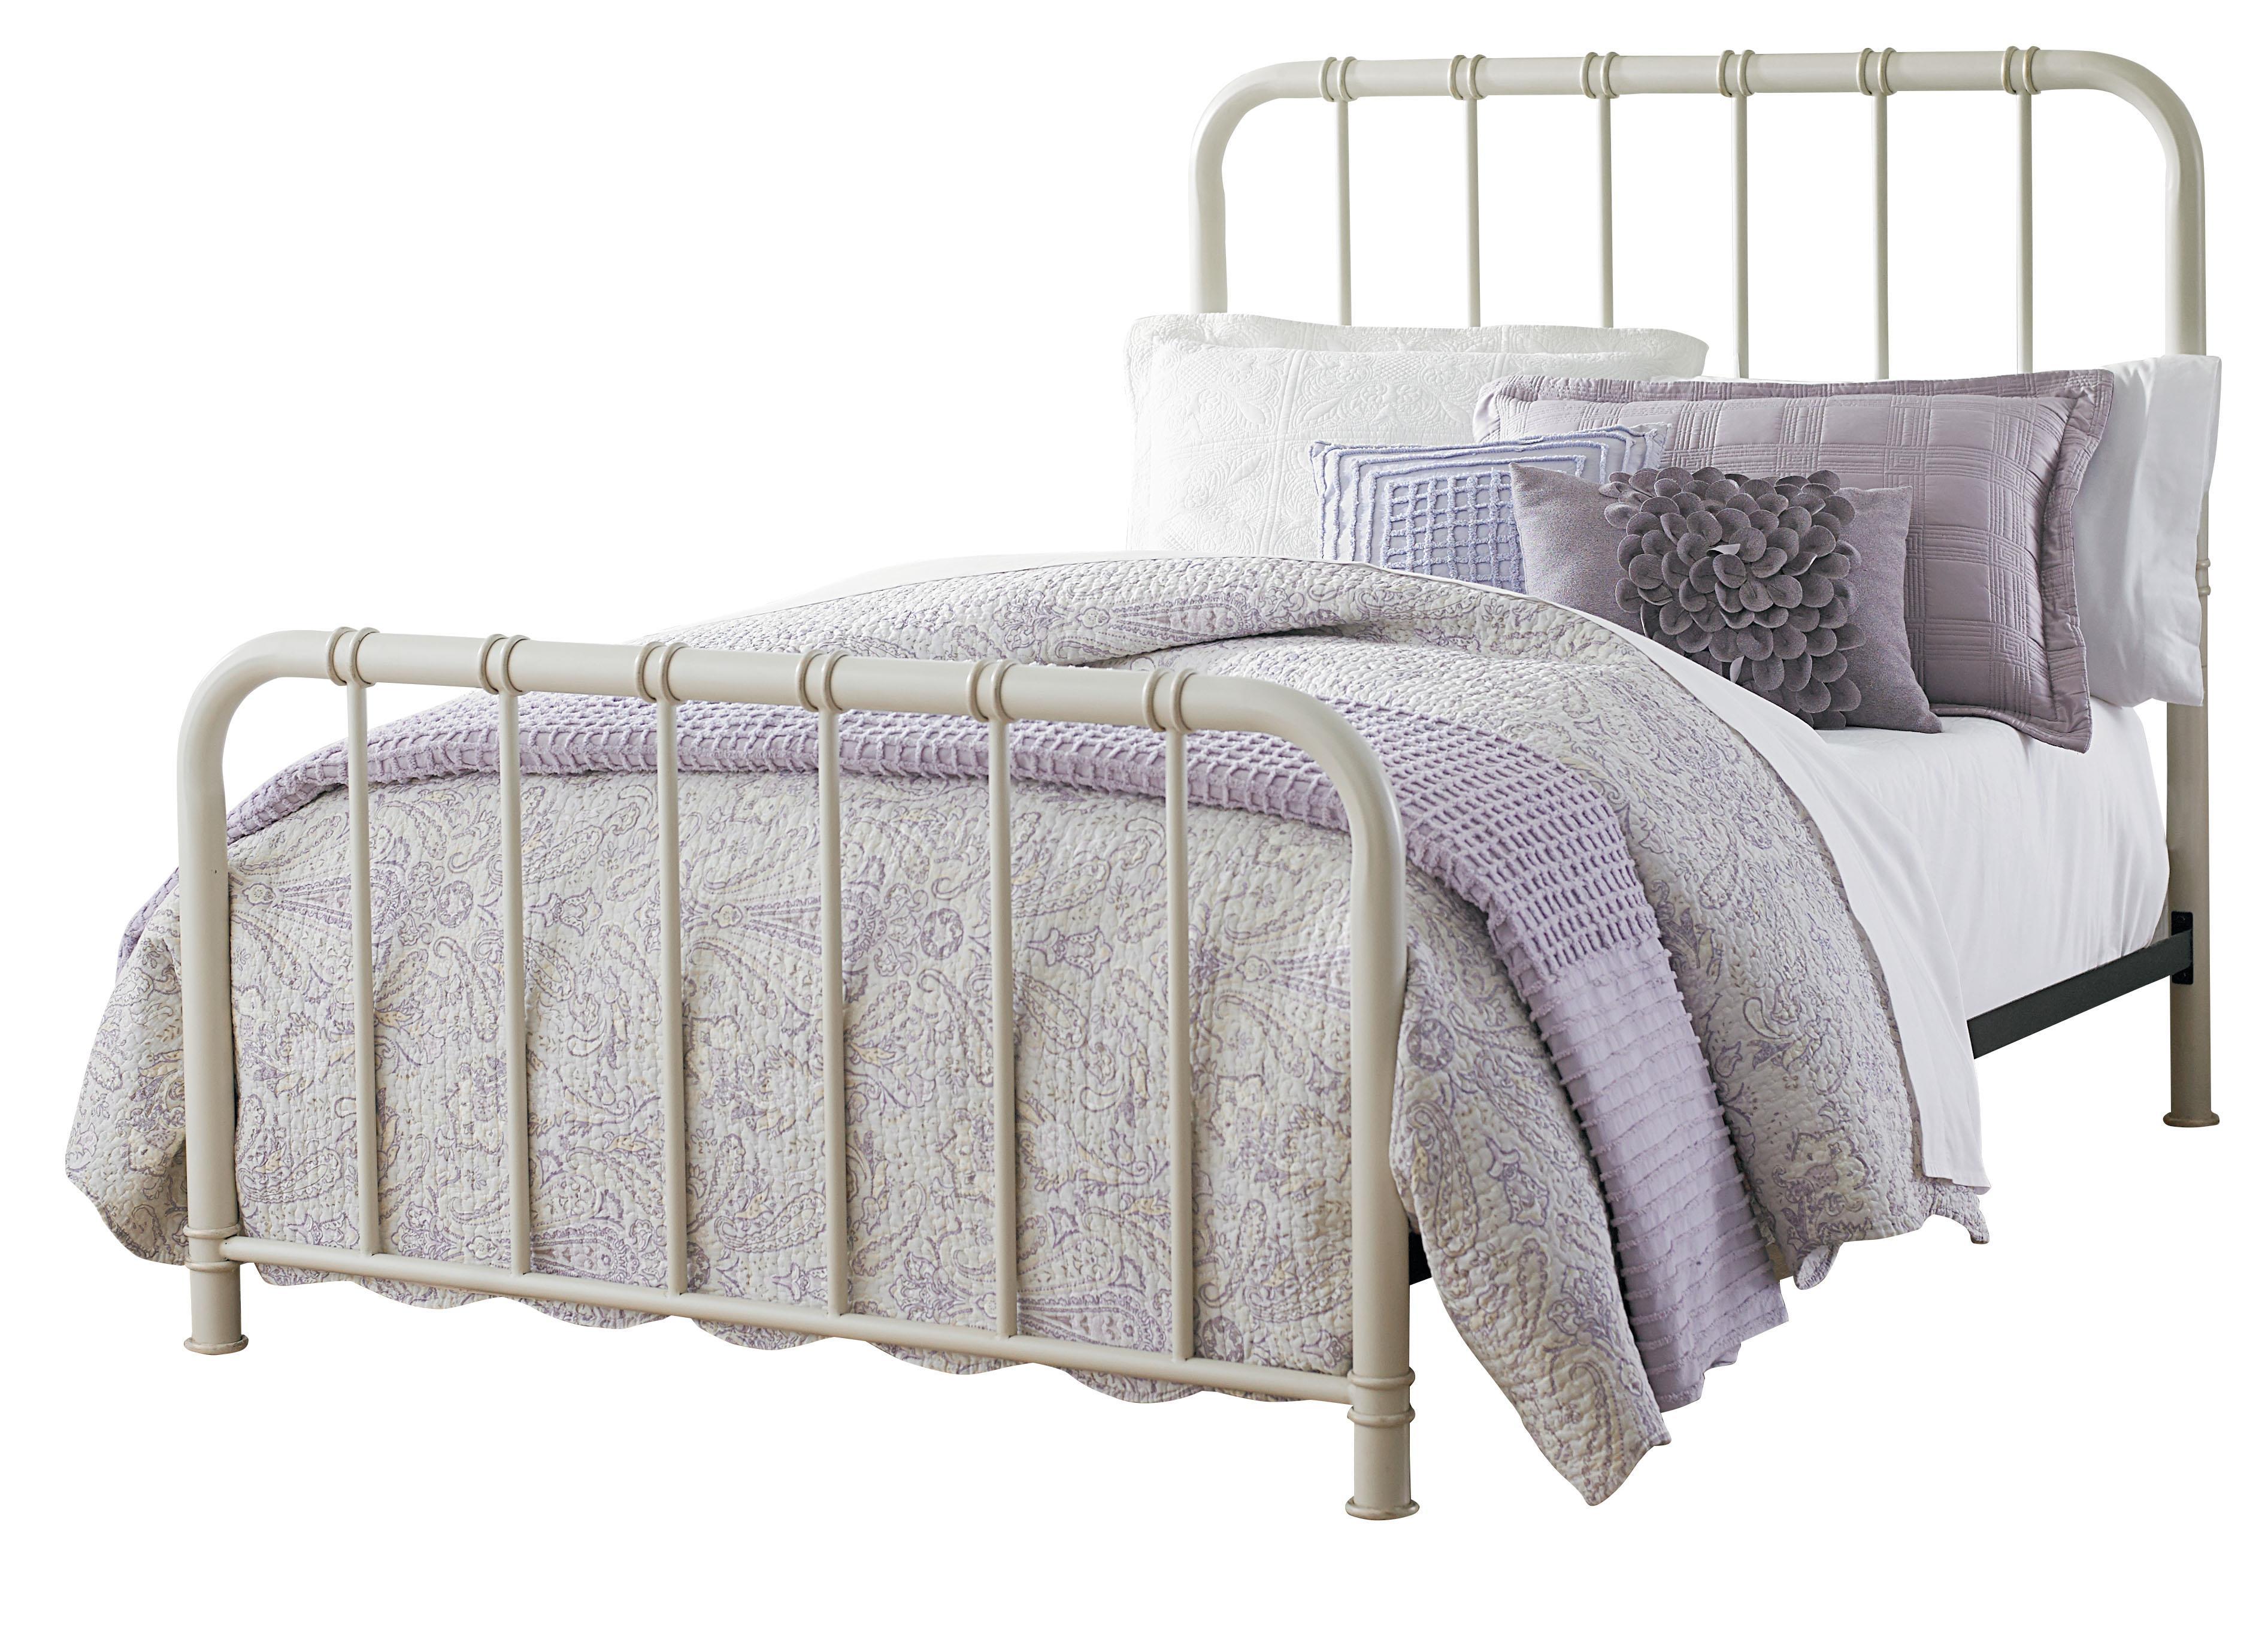 Standard Furniture Tristen Twin Metal Bed - Item Number: 87551+52